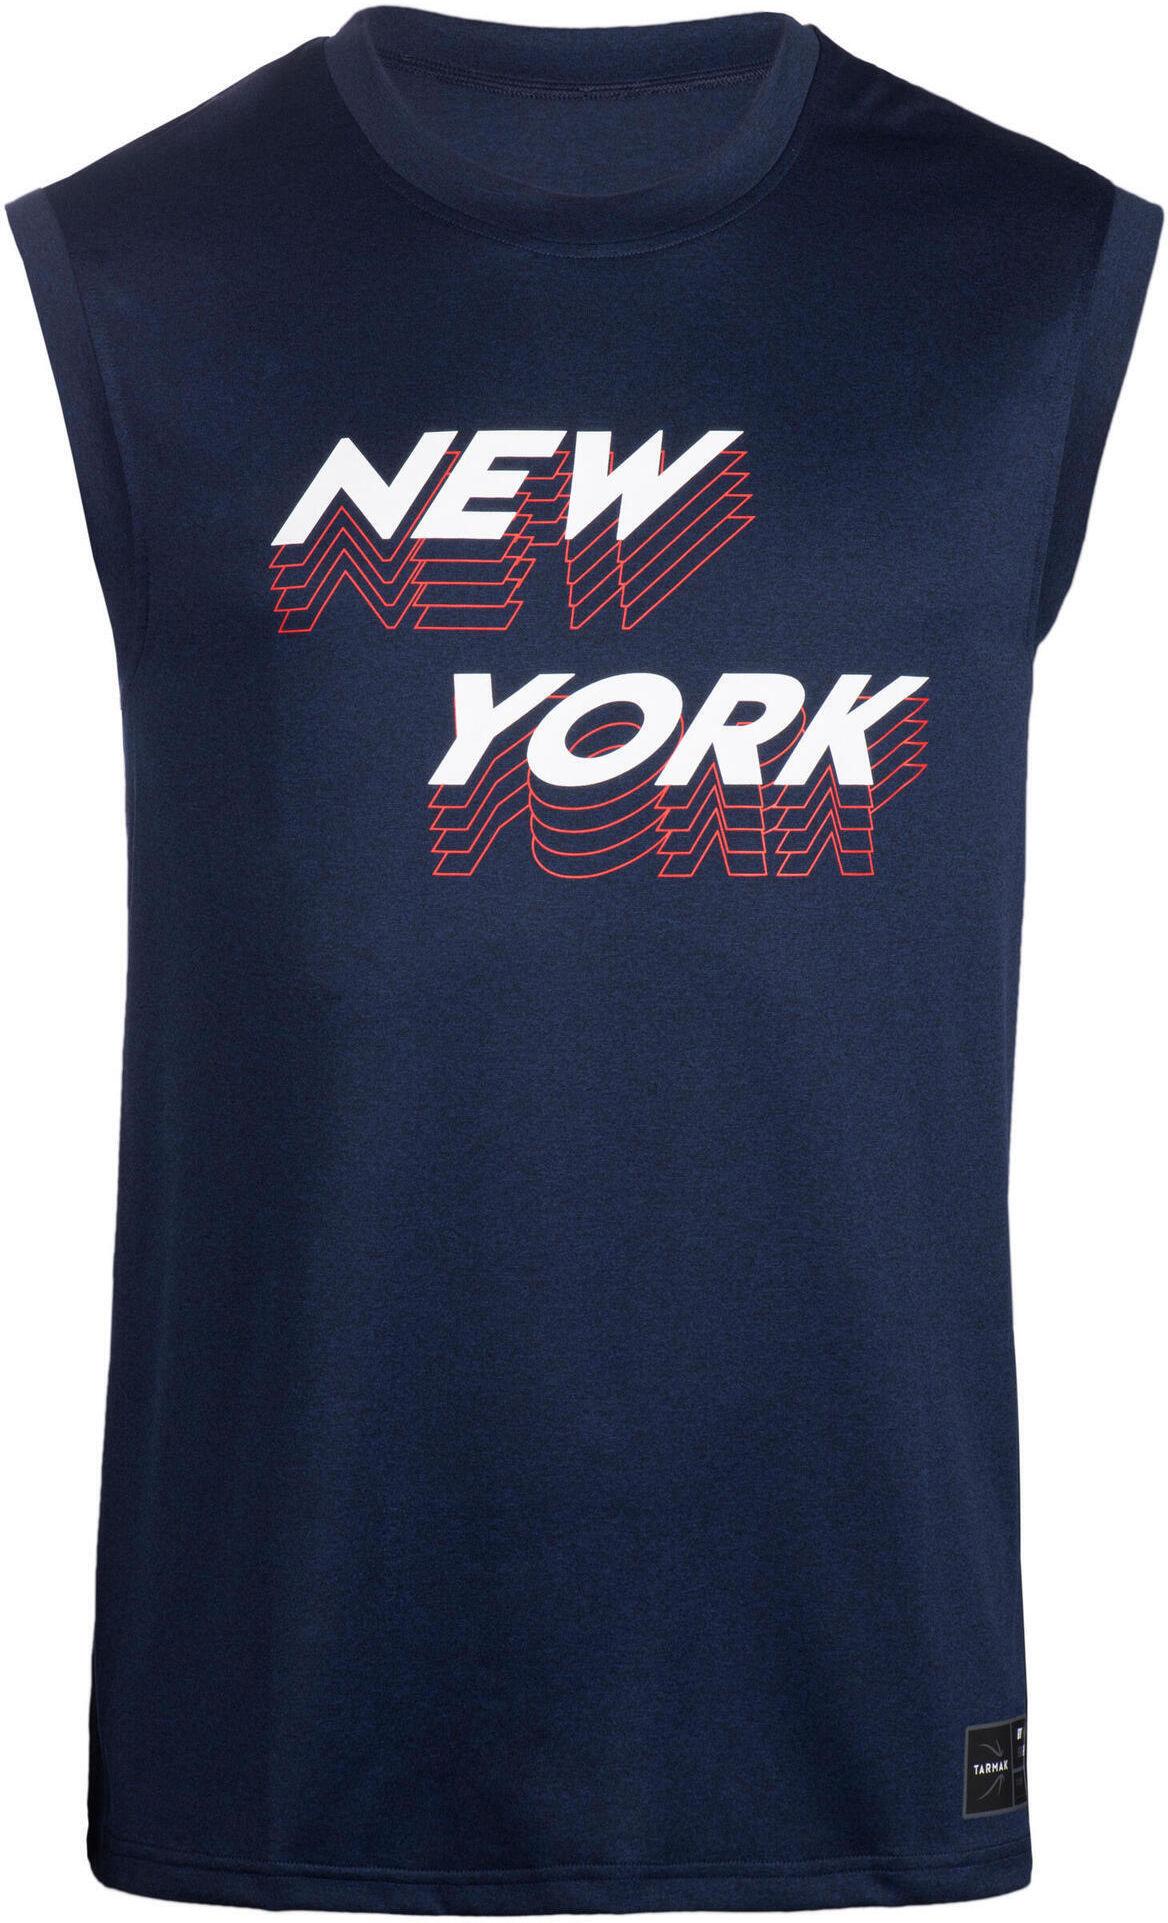 Koszulka bez rękawów do koszykówki TS500 męska NEW YORK